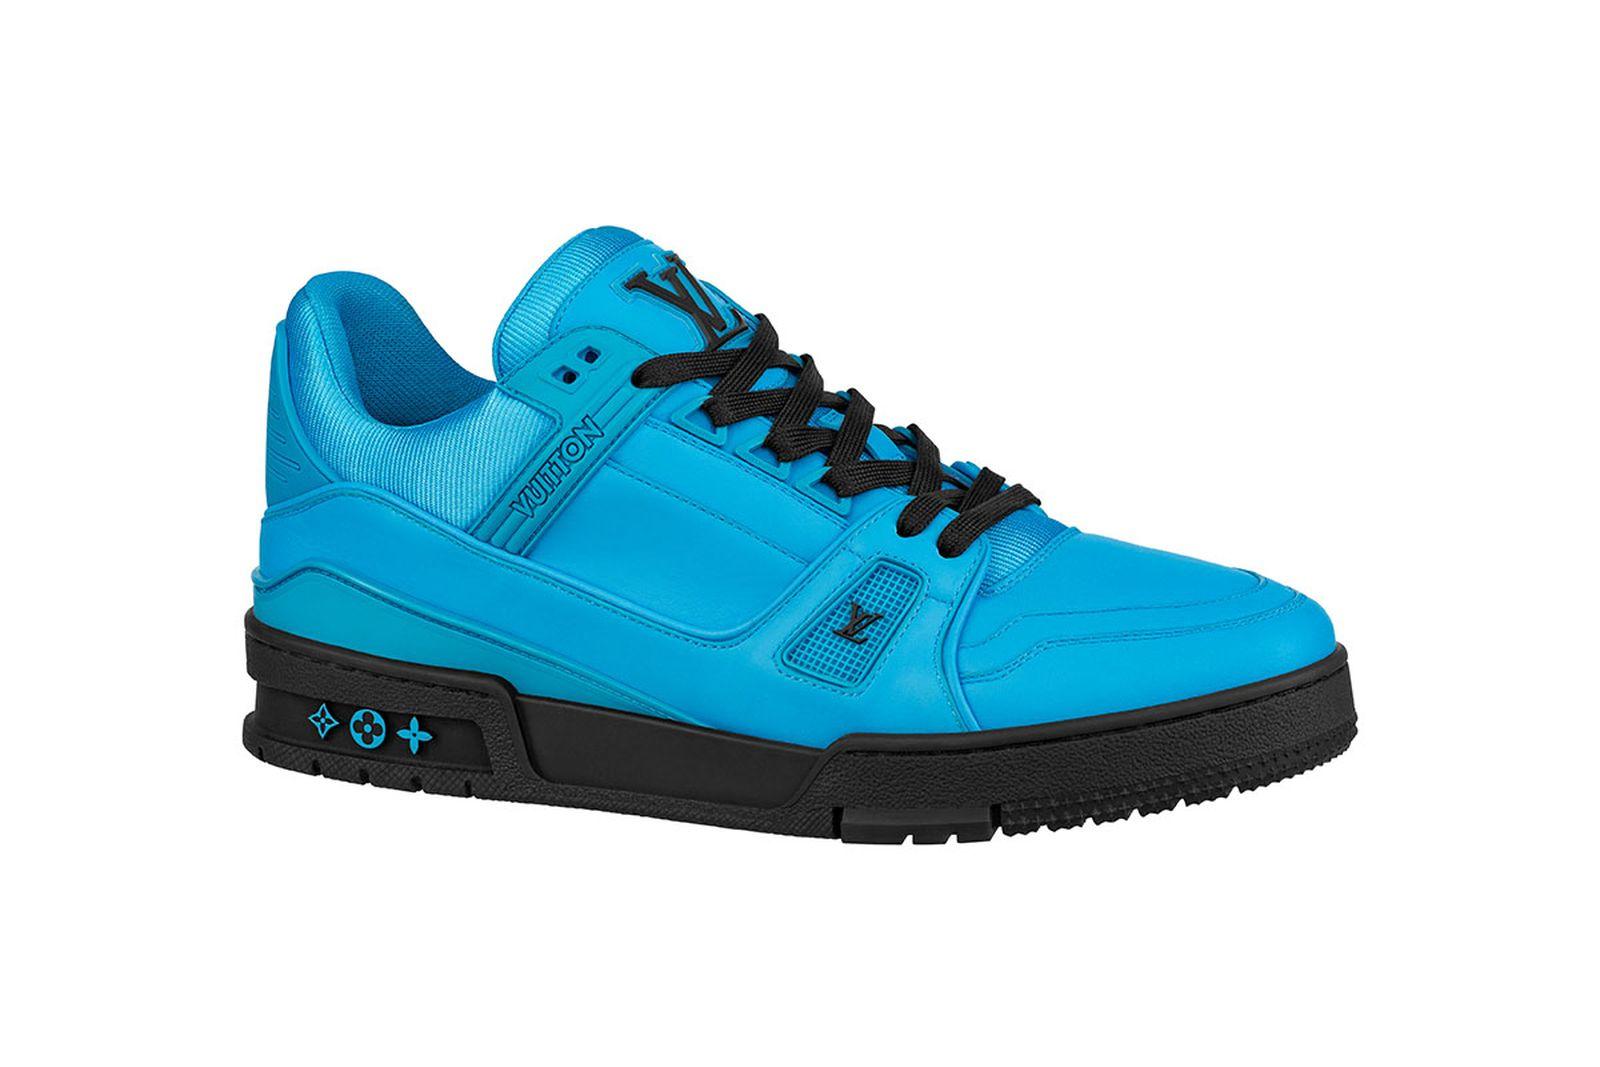 louis-vuitton-rainbow-outerwear-footwear-07